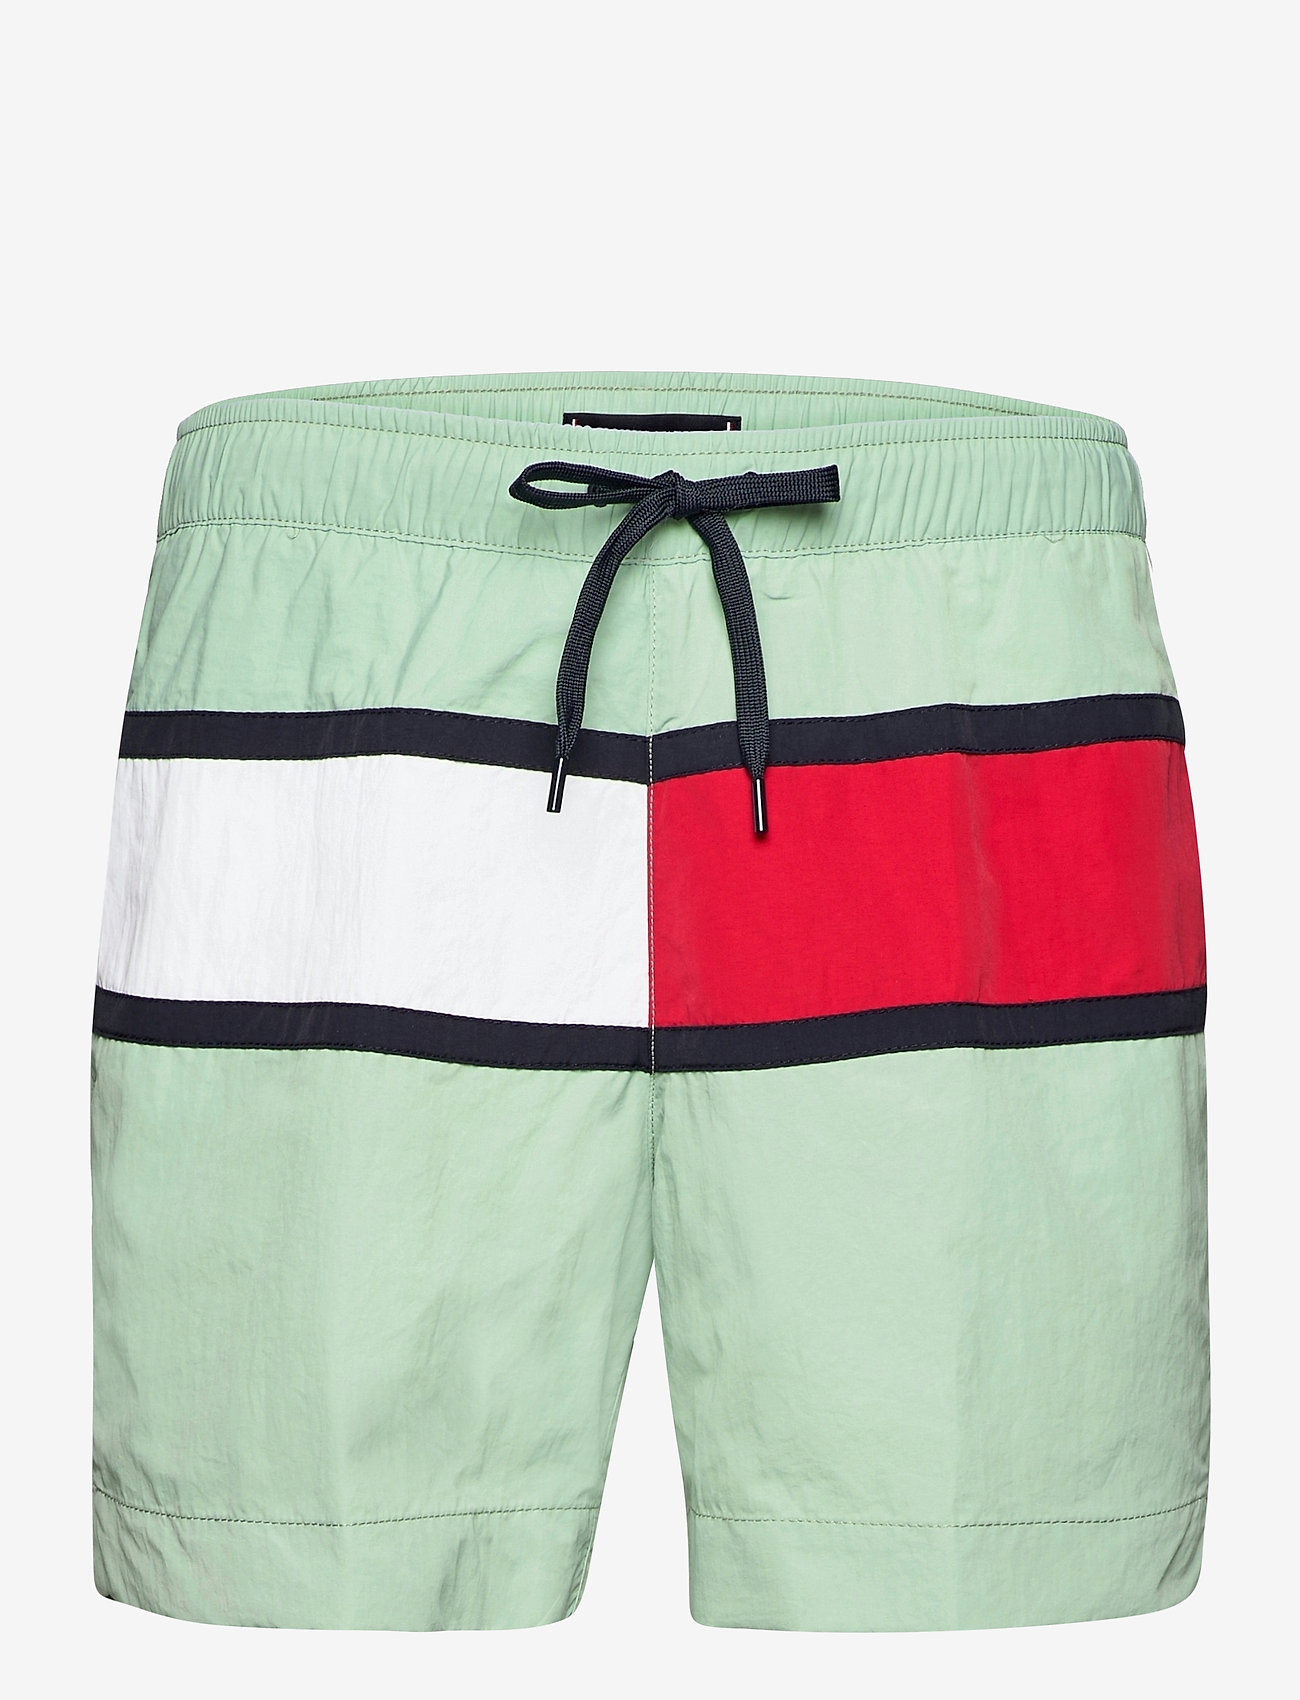 Tommy Hilfiger - MEDIUM DRAWSTRING - shorts de bain - sea mist mint - 0